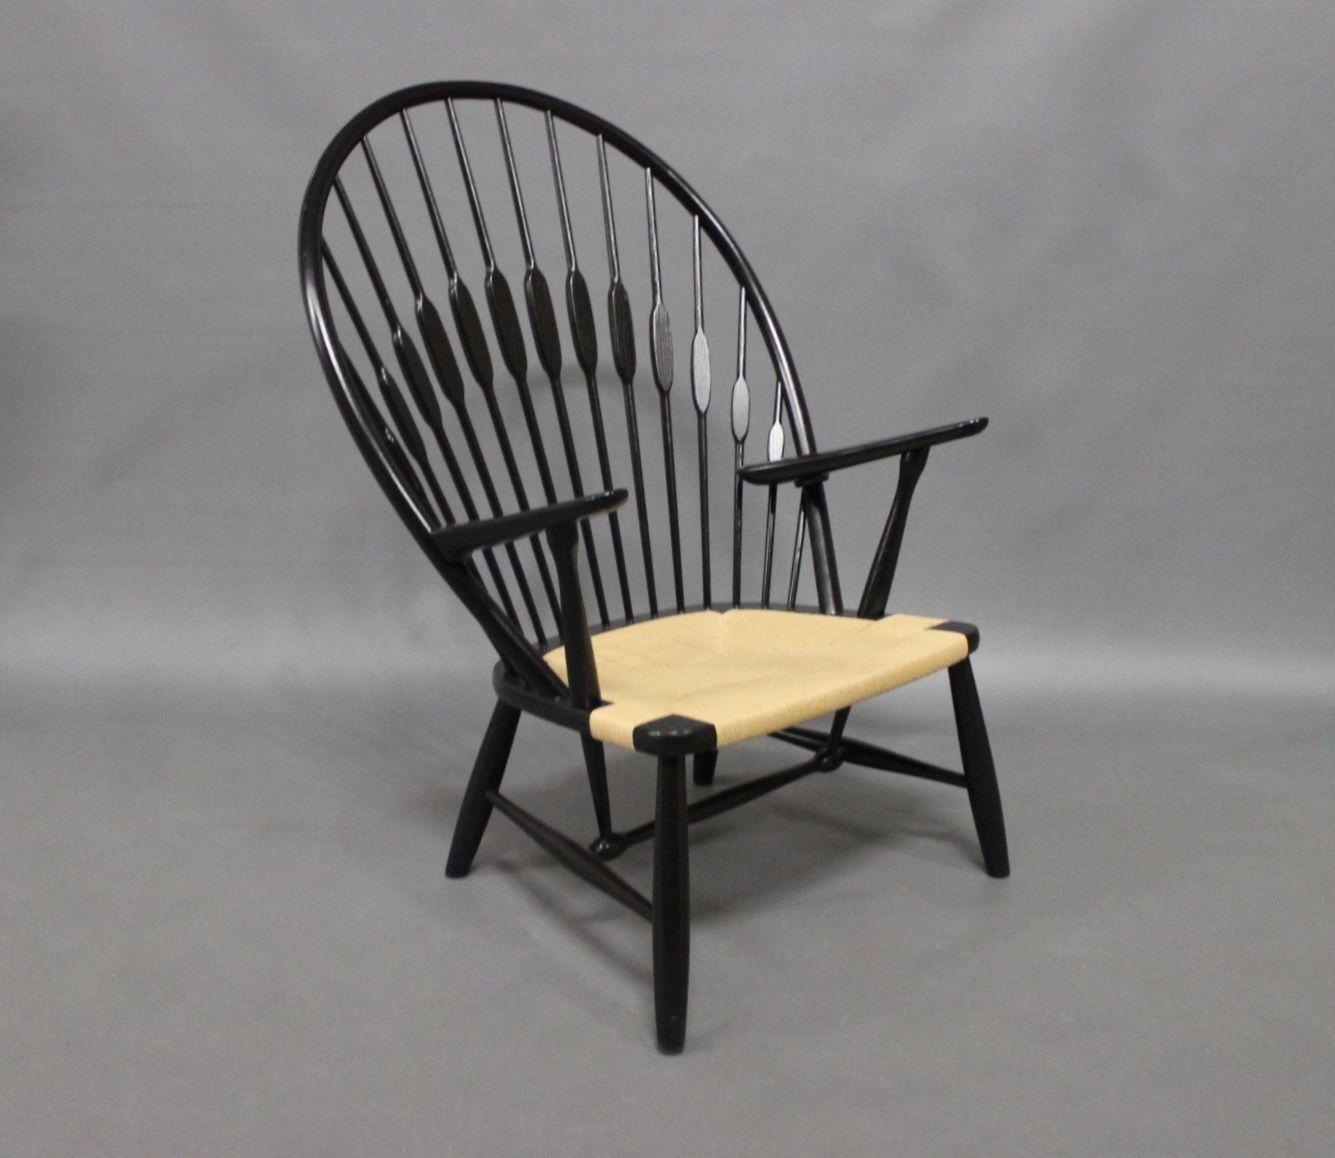 hans wegner peacock chair. Vintage Peacock Chair By Hans J. Wegner, 1980s Wegner 5